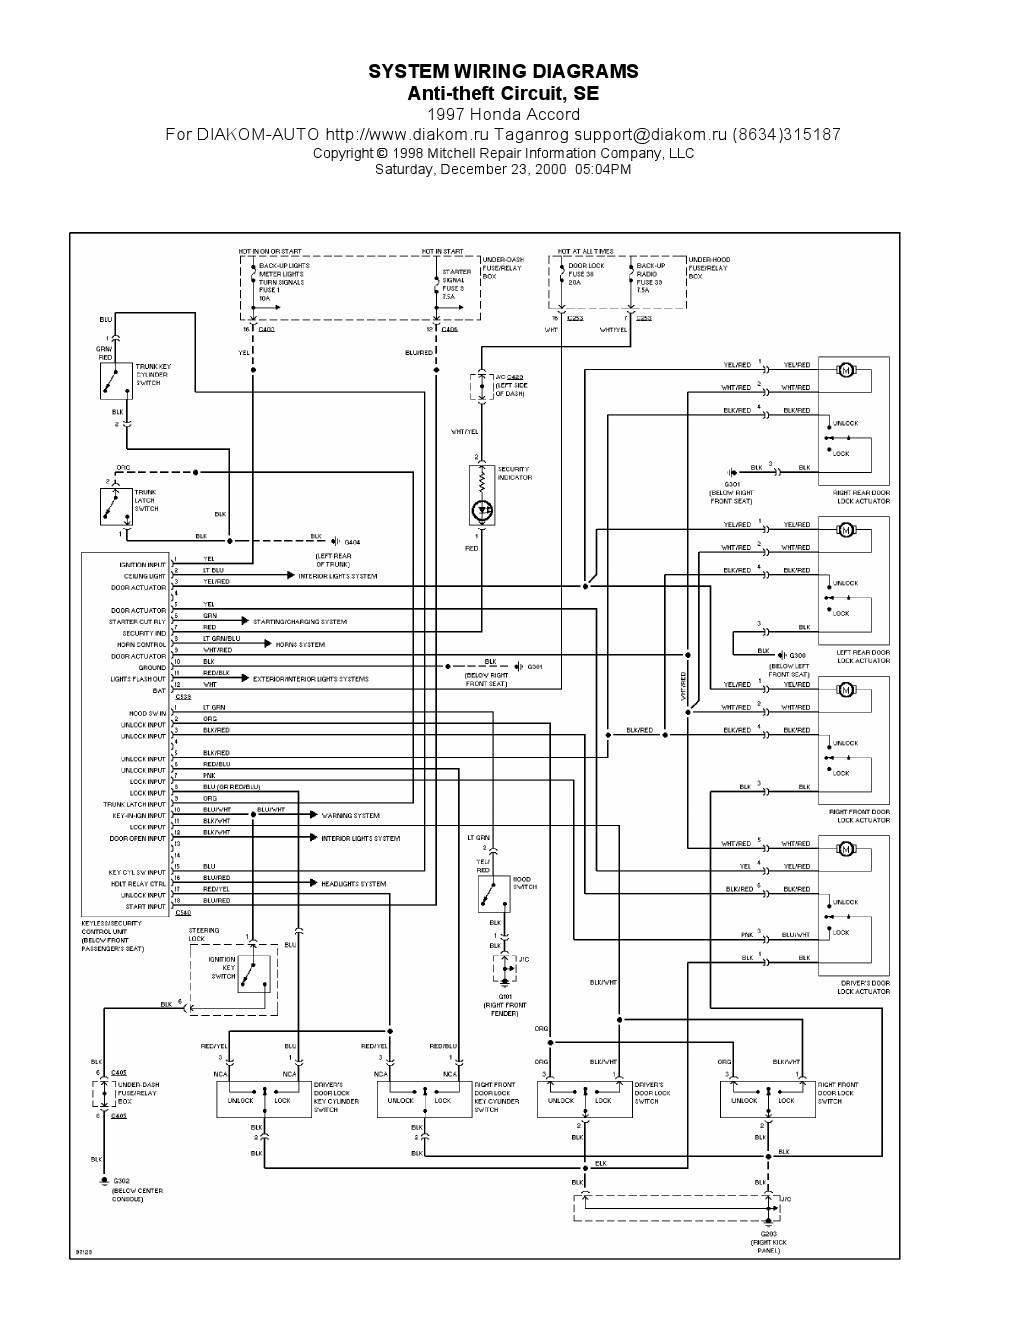 1993 honda accord headlight wiring diagram 2004 wrx 97 all data 2008